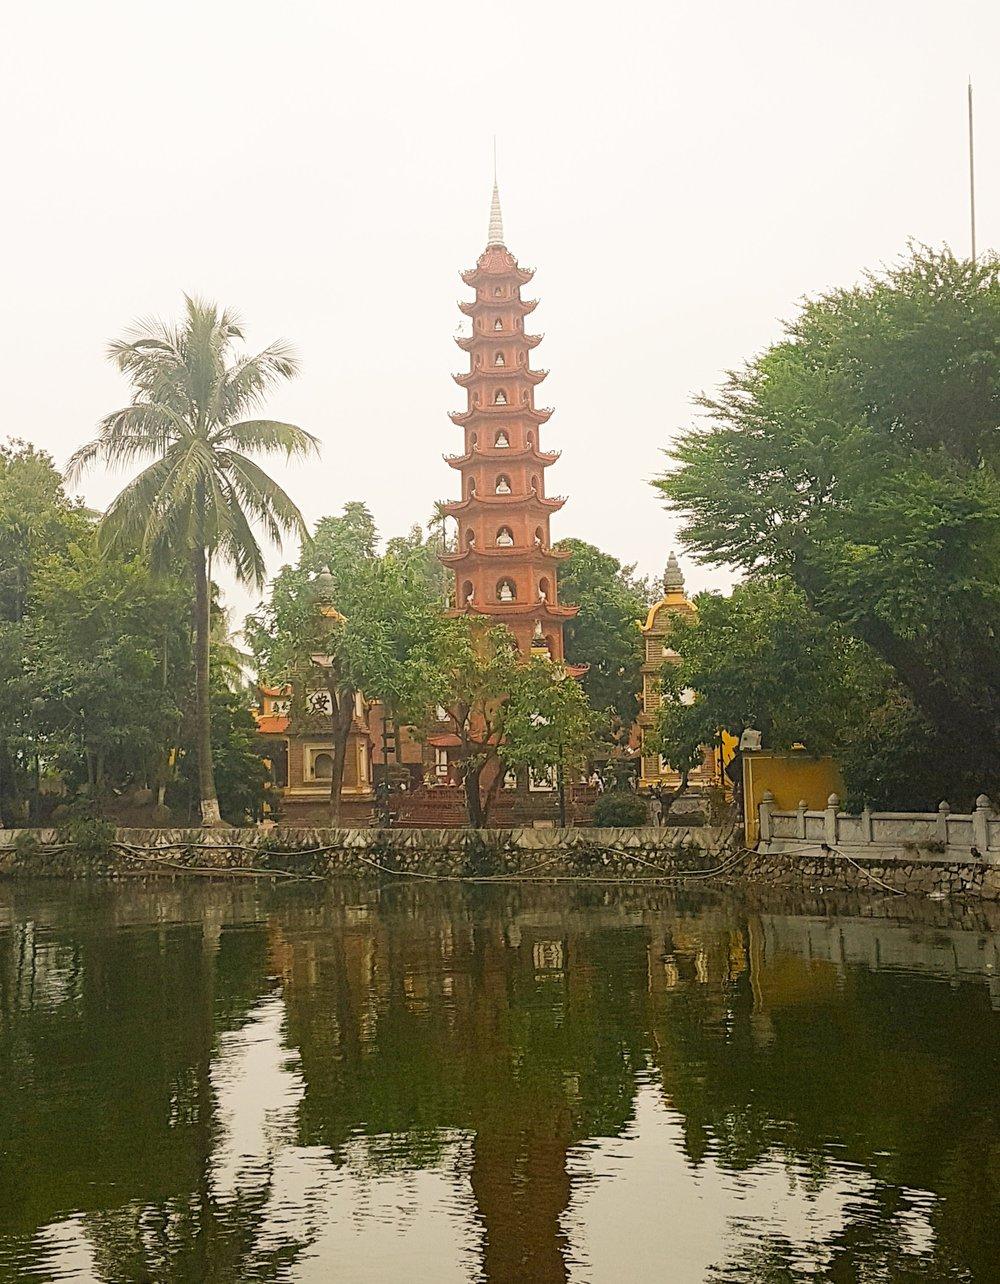 Visiting a Pagoda in Hanoi